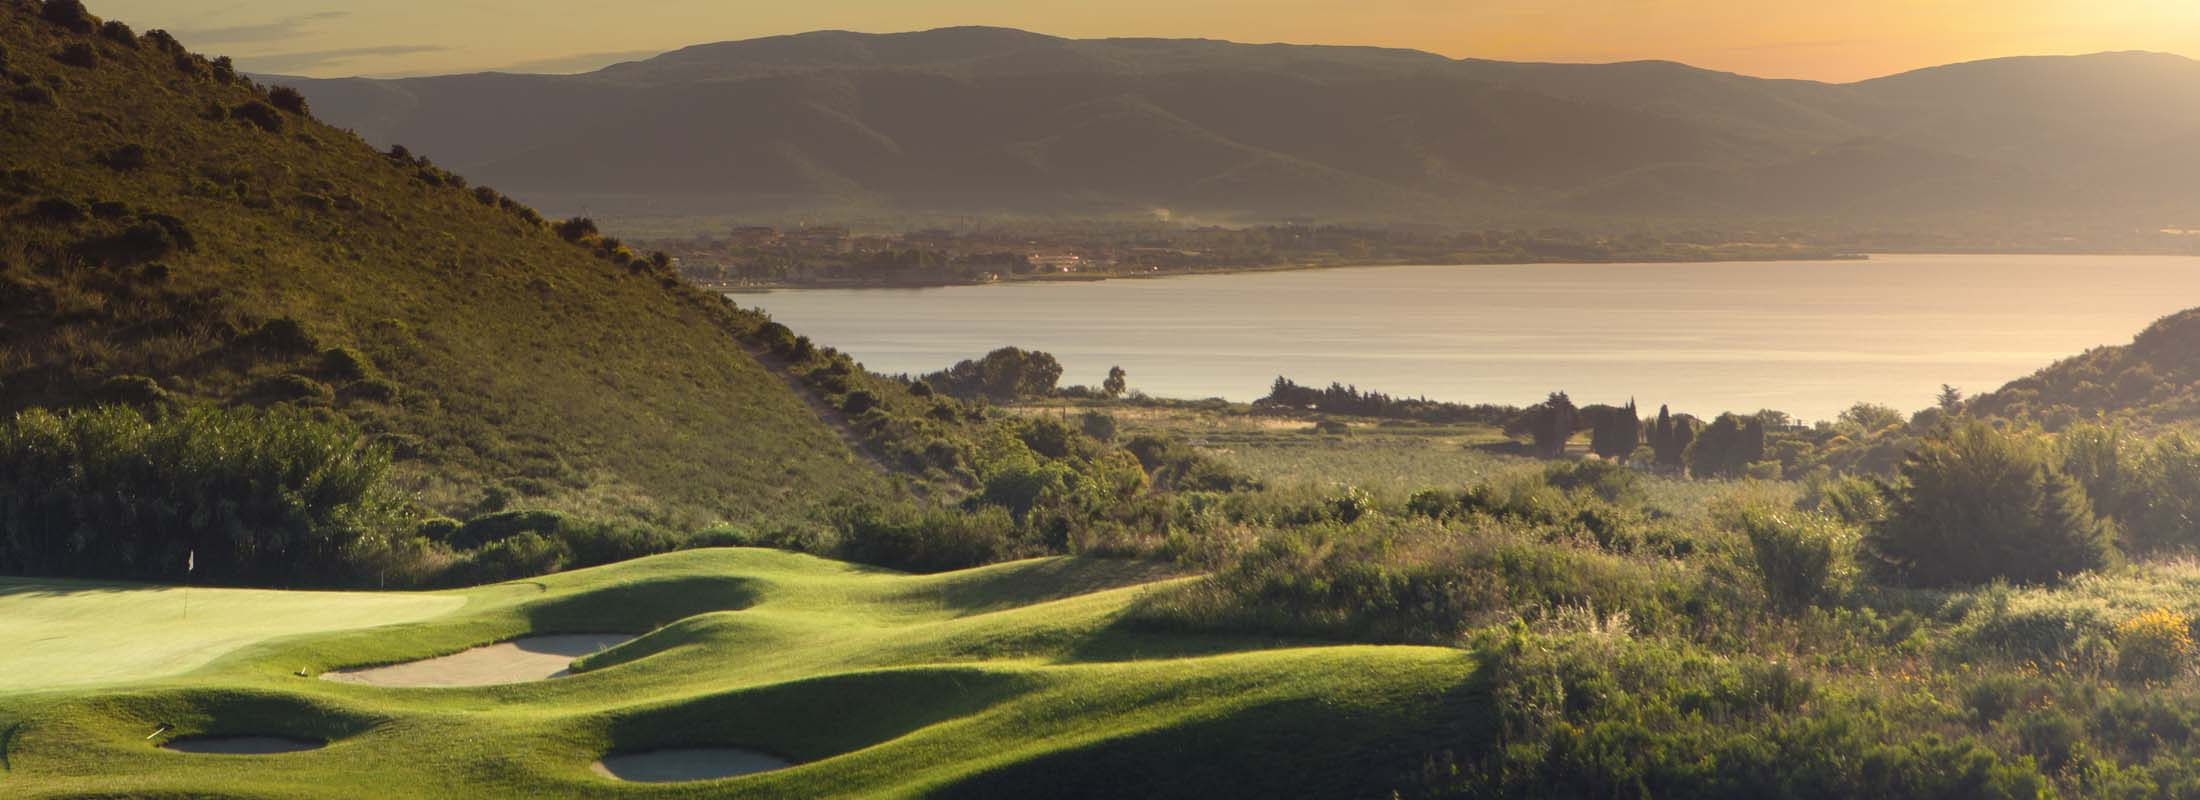 argentario-golf-club-13